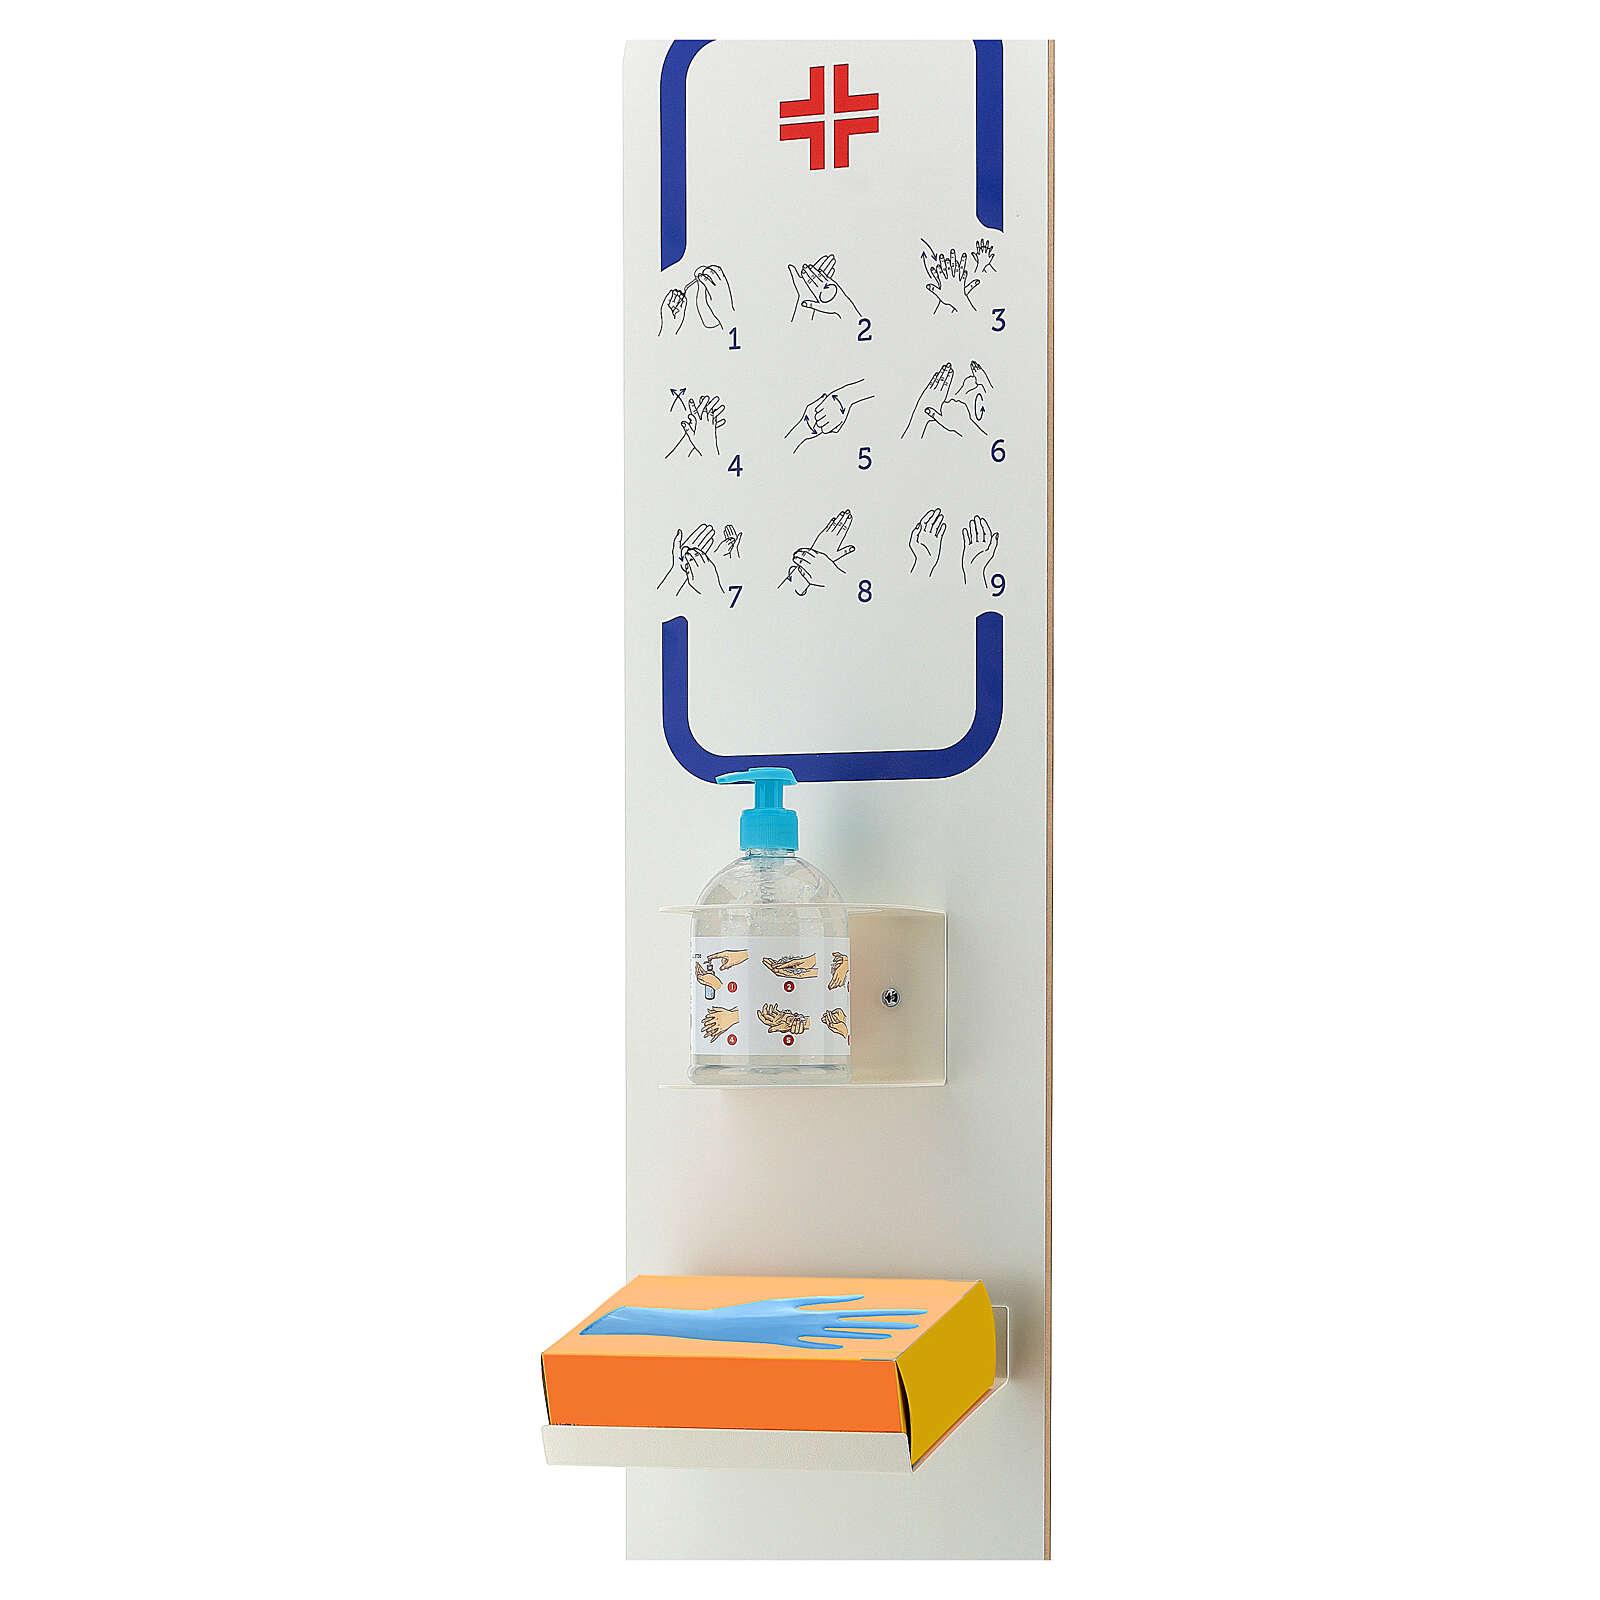 Hände-Desinfektionsmittelspender 3